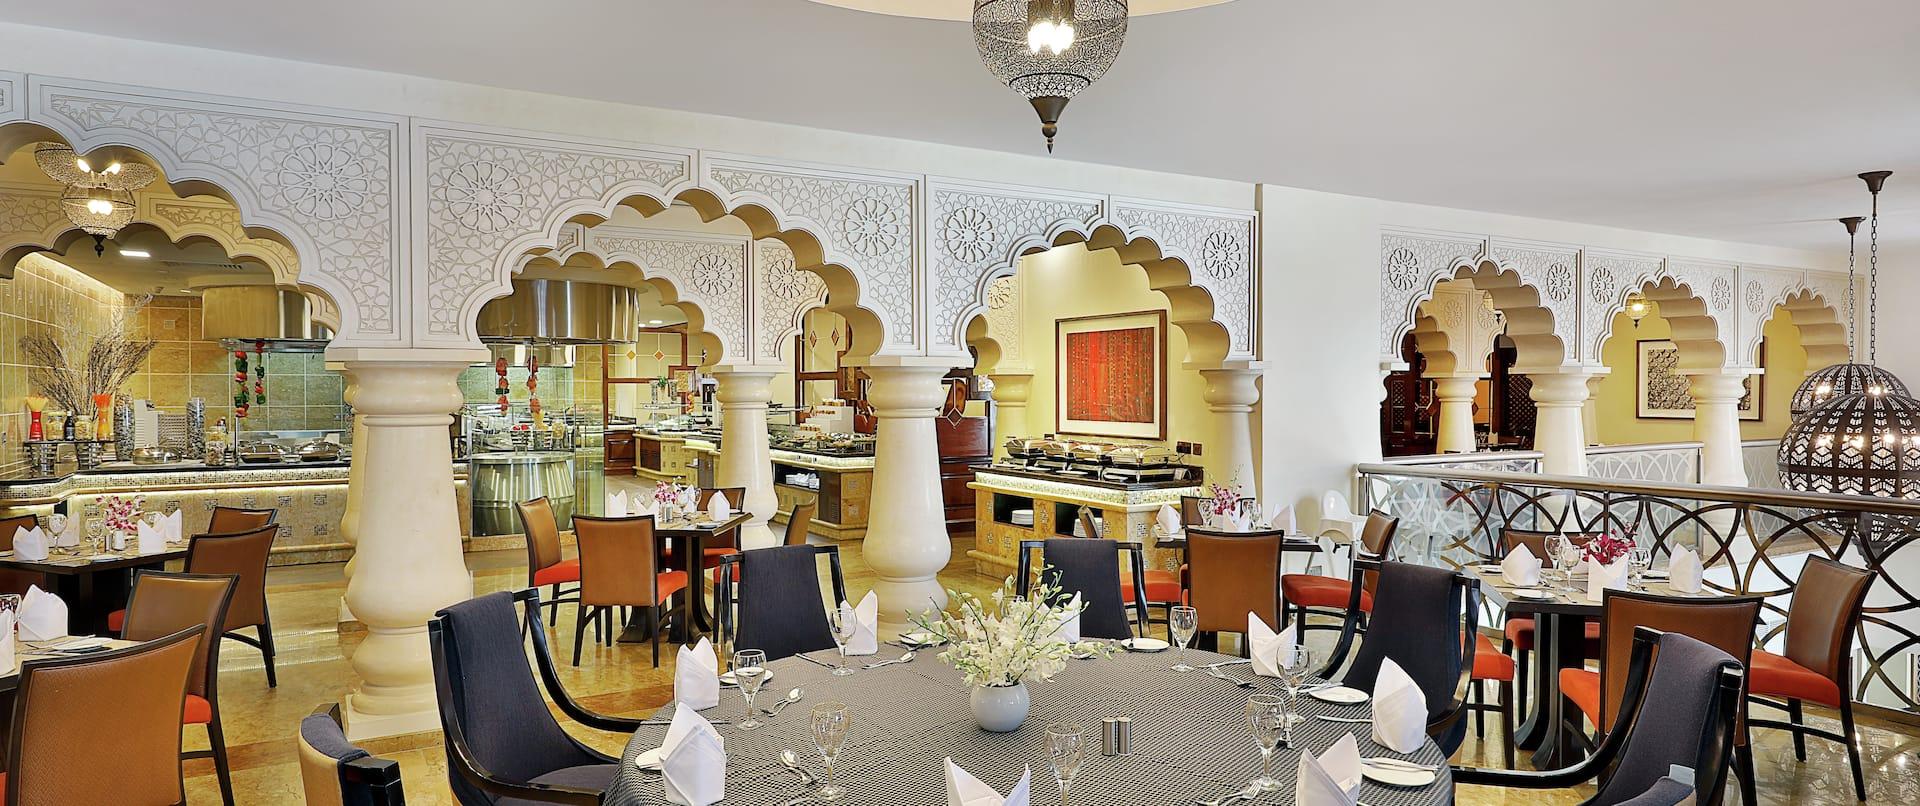 Alorchid Restaurant